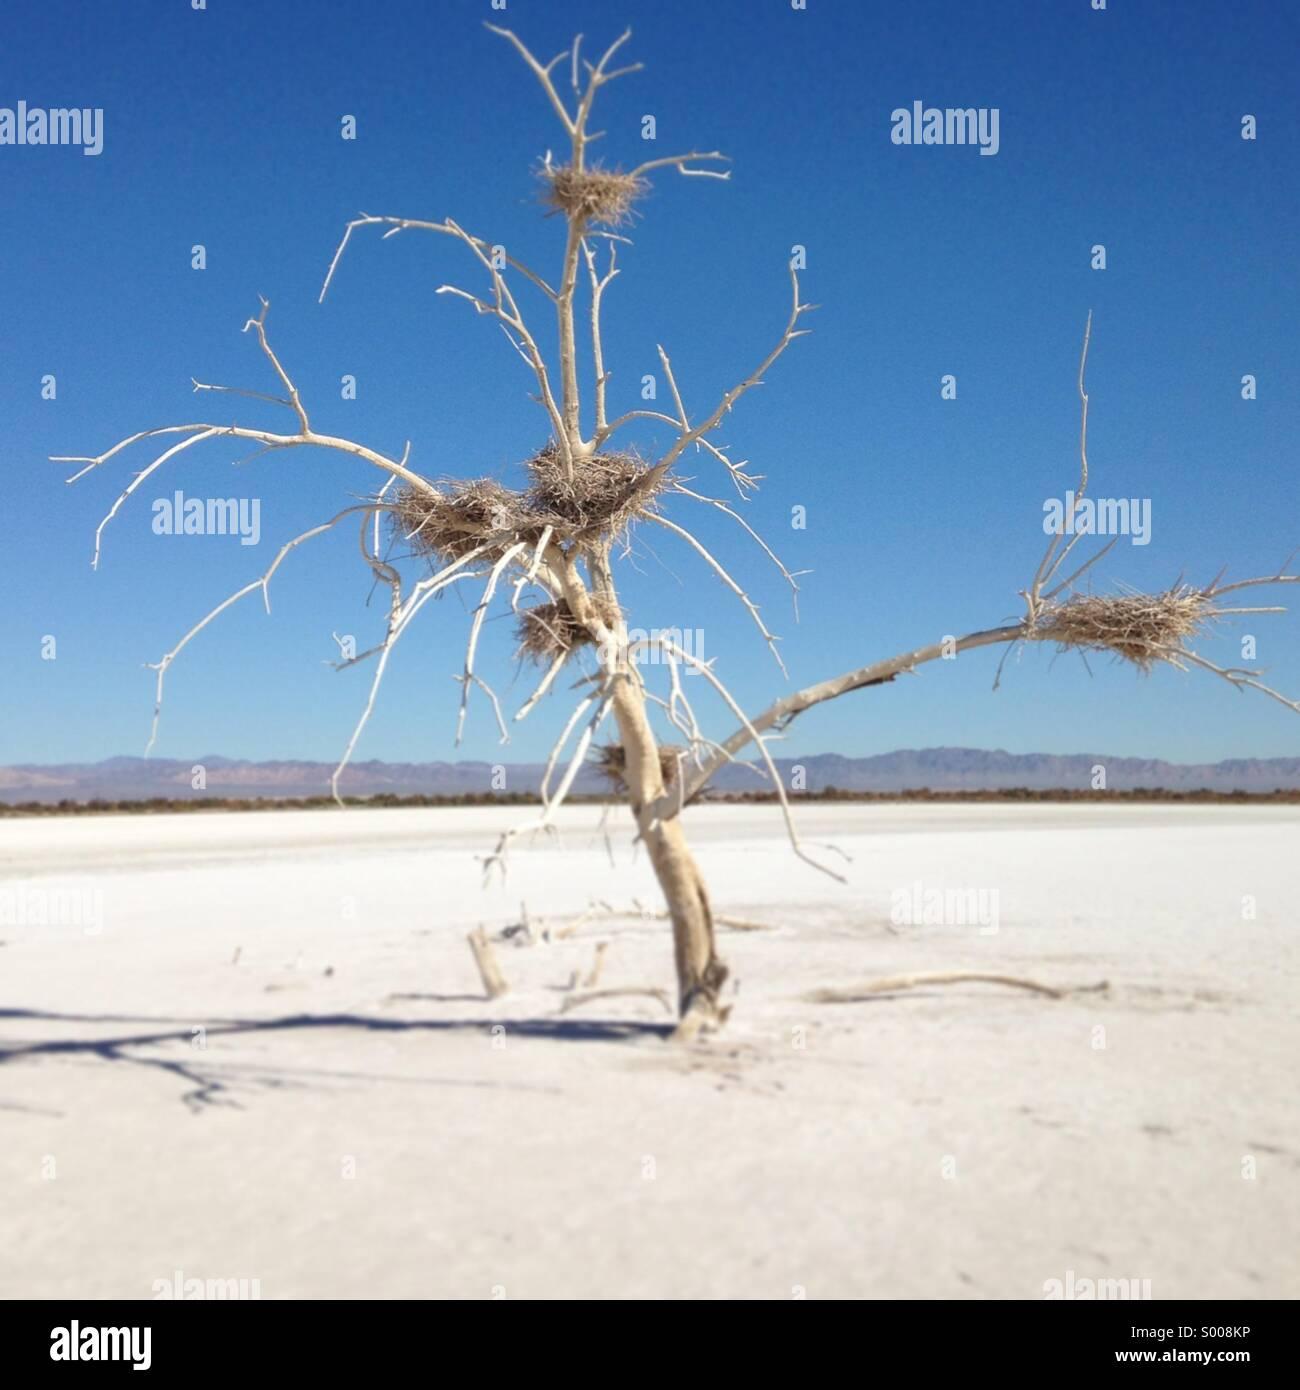 Dead tree with bird nests on salt flats at the Salton Sea, Niland, Calif. - Stock Image